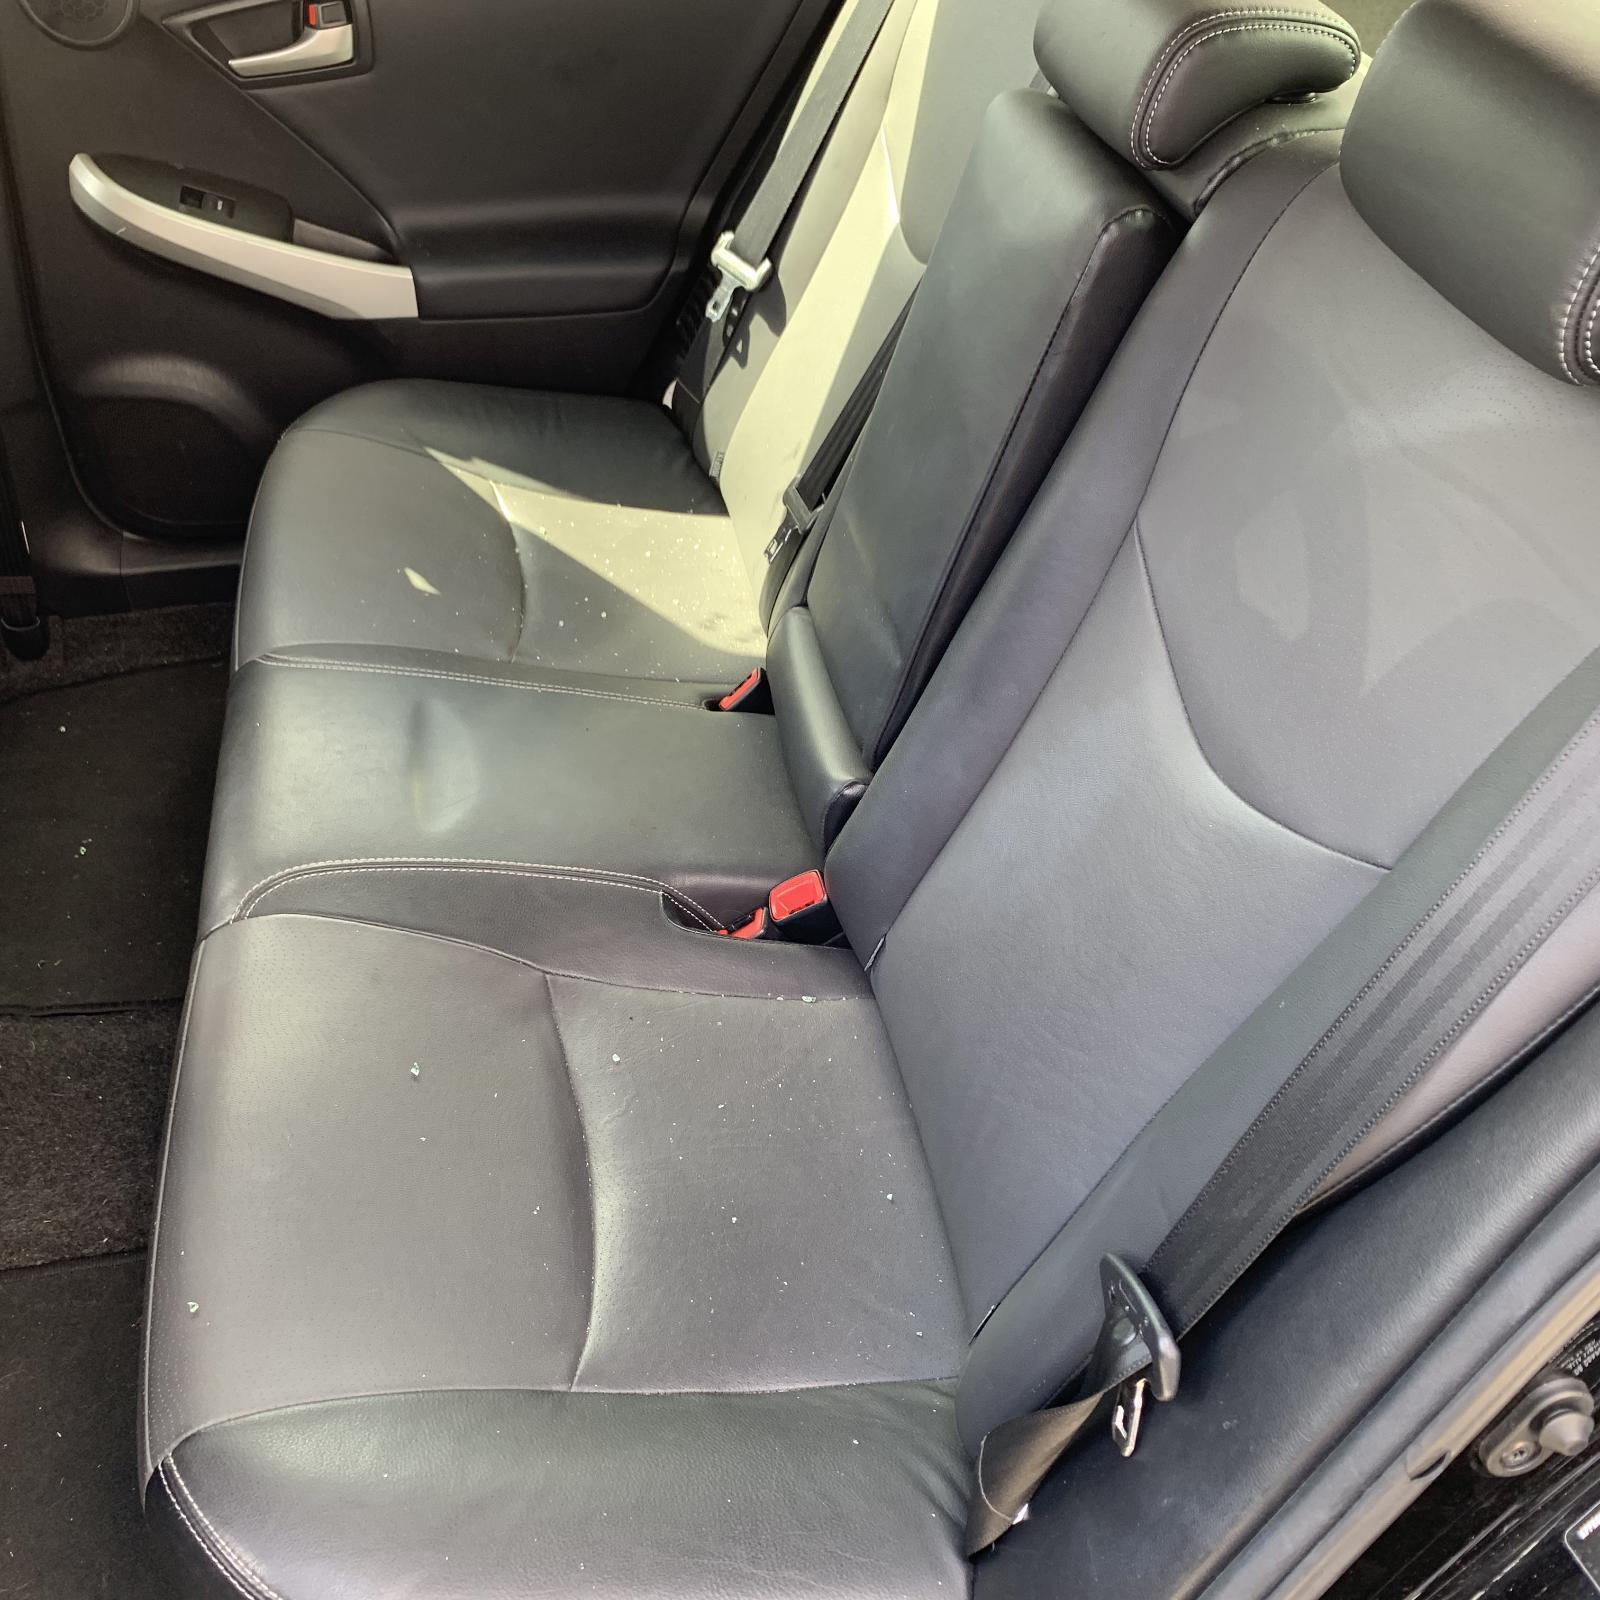 TOYOTA PRIUS, 2nd Seat (Rear Seat), RH REAR, ZVW30R, LEATHER, GREY, 07/09-12/15